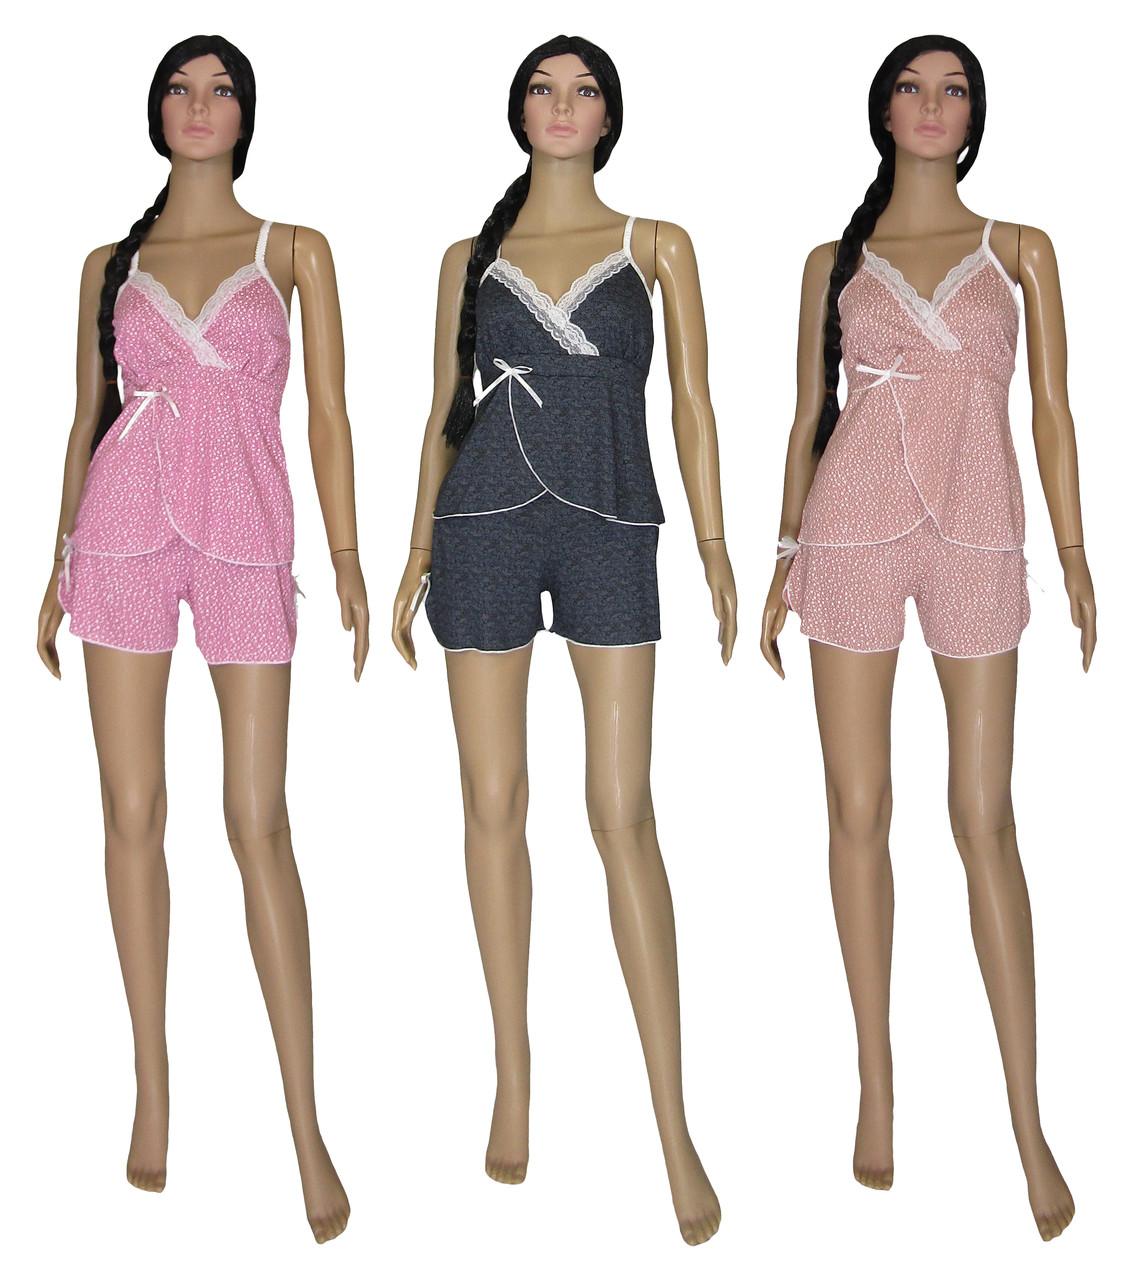 Пижама женская 03221-3 Charm бамбук, майка и шорты, р.р.40-54